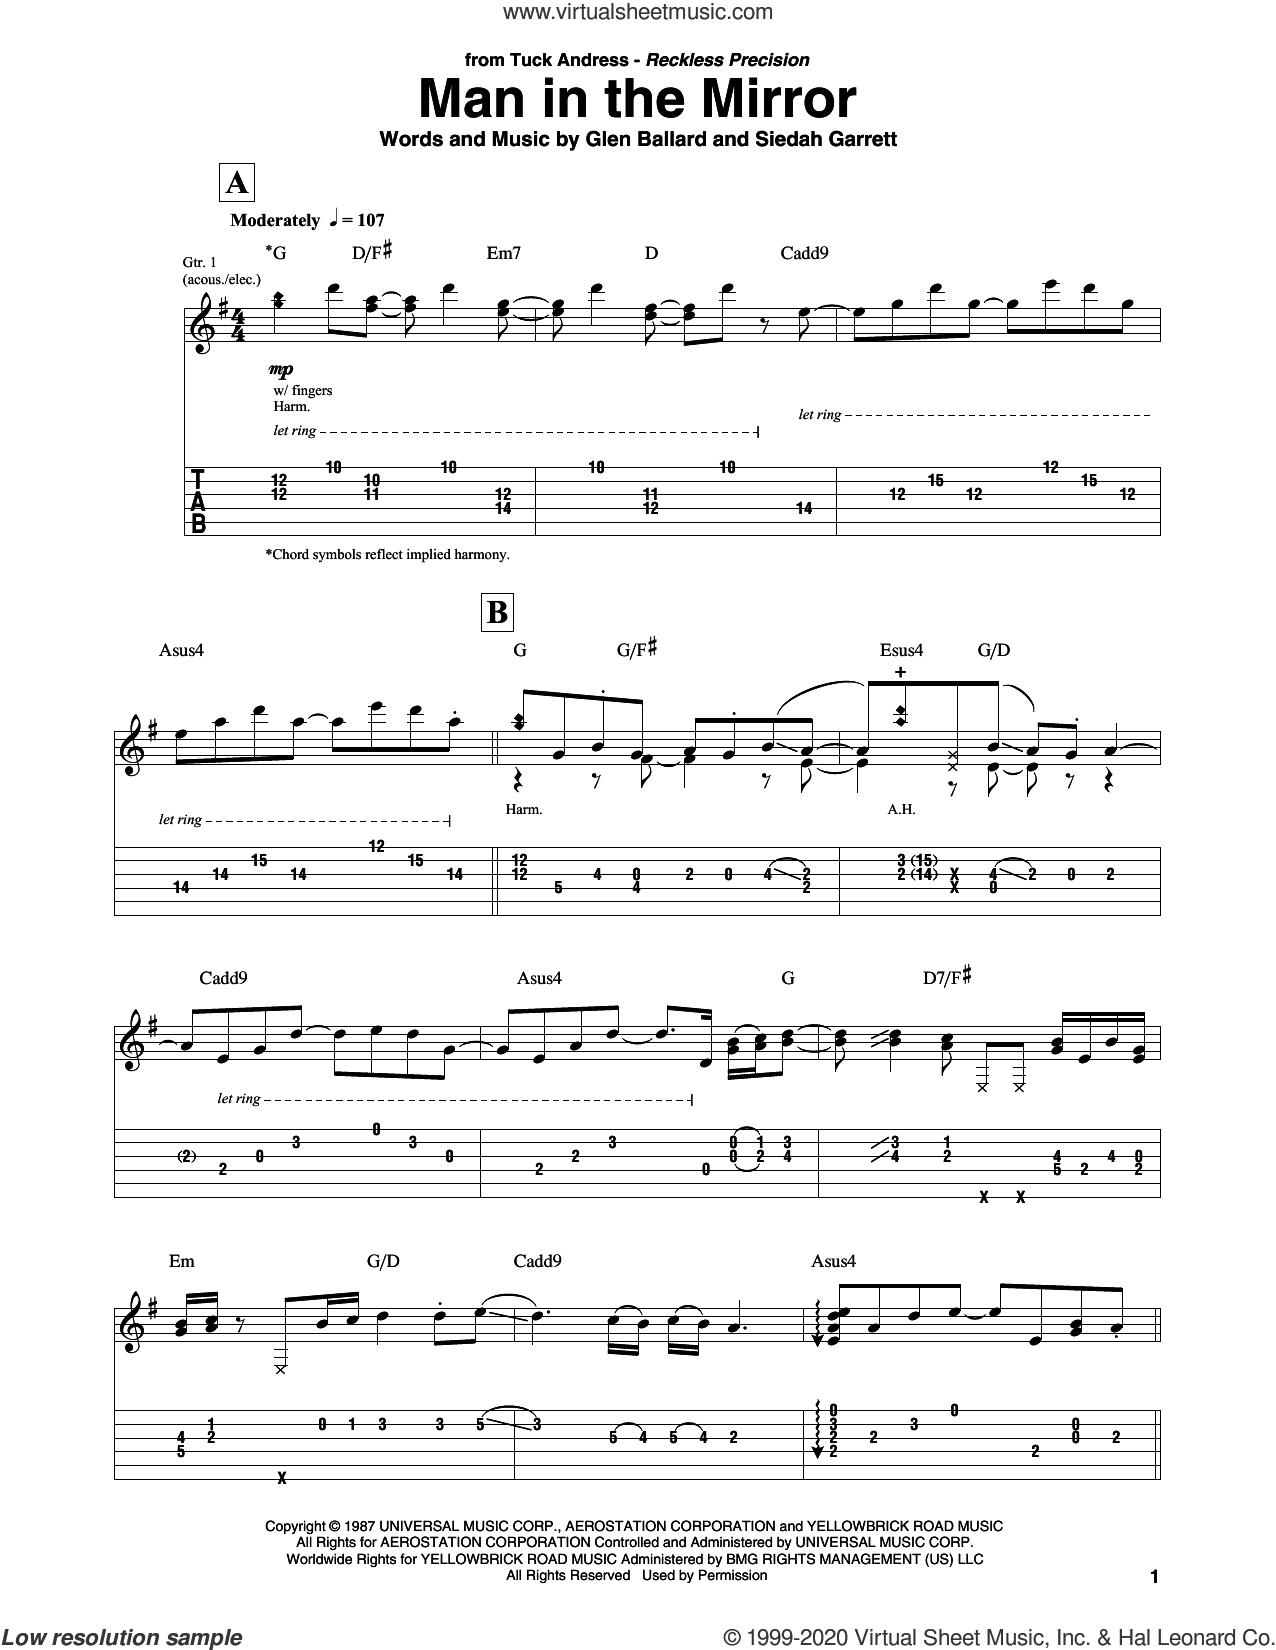 Man In The Mirror sheet music for guitar solo by Michael Jackson, Glen Ballard and Siedah Garrett, intermediate skill level